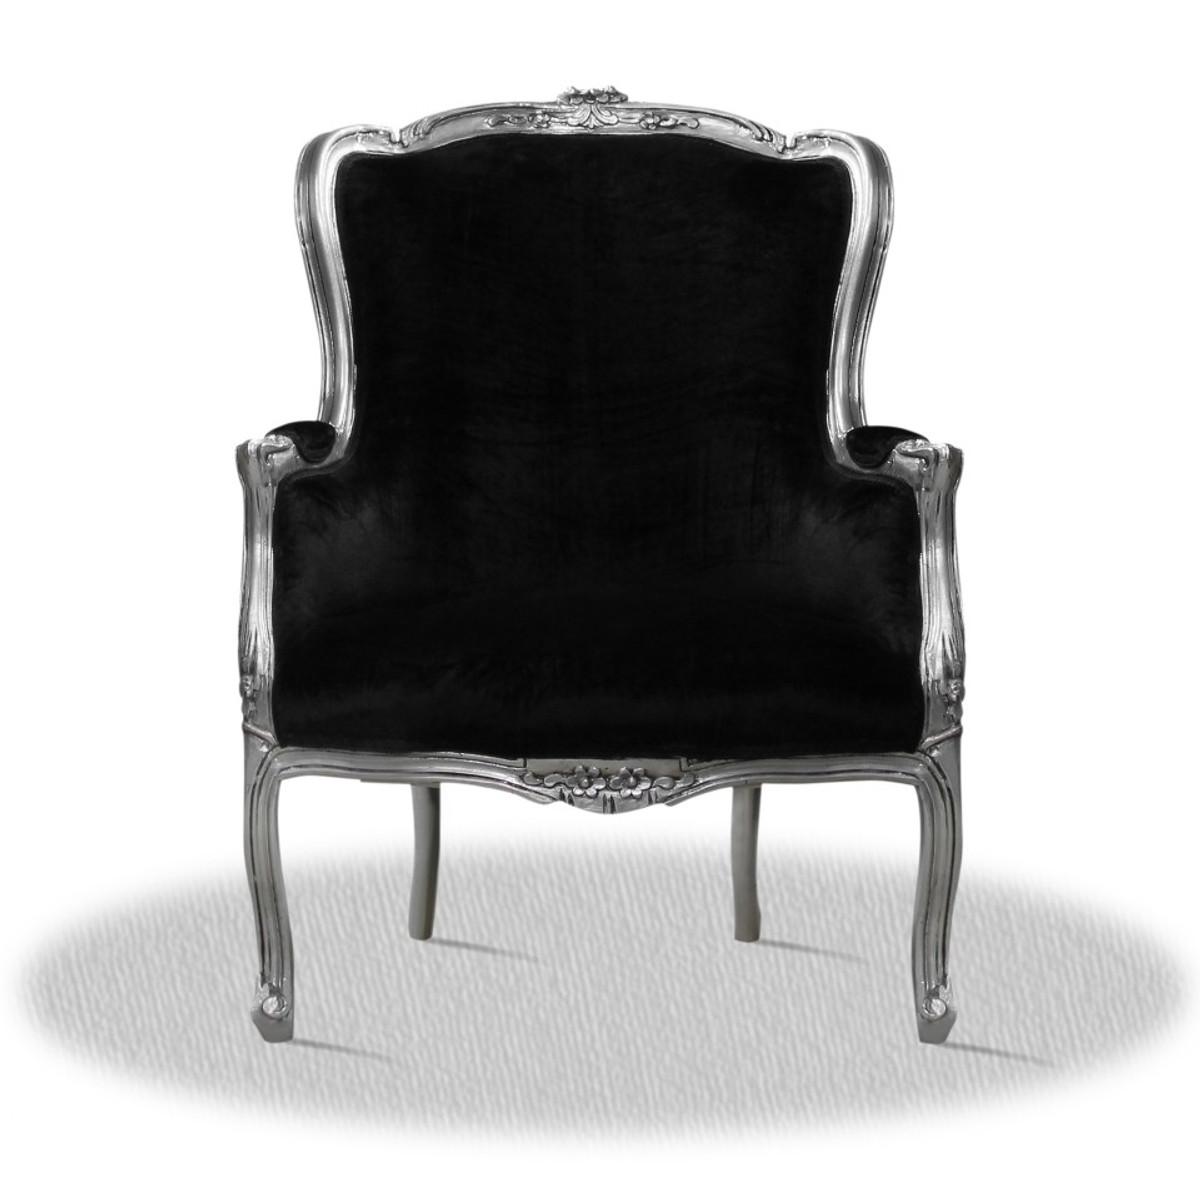 Casa Padrino Barock Salon Wohnzimmer Sessel Silber Schwarz 70 x 65 x ...